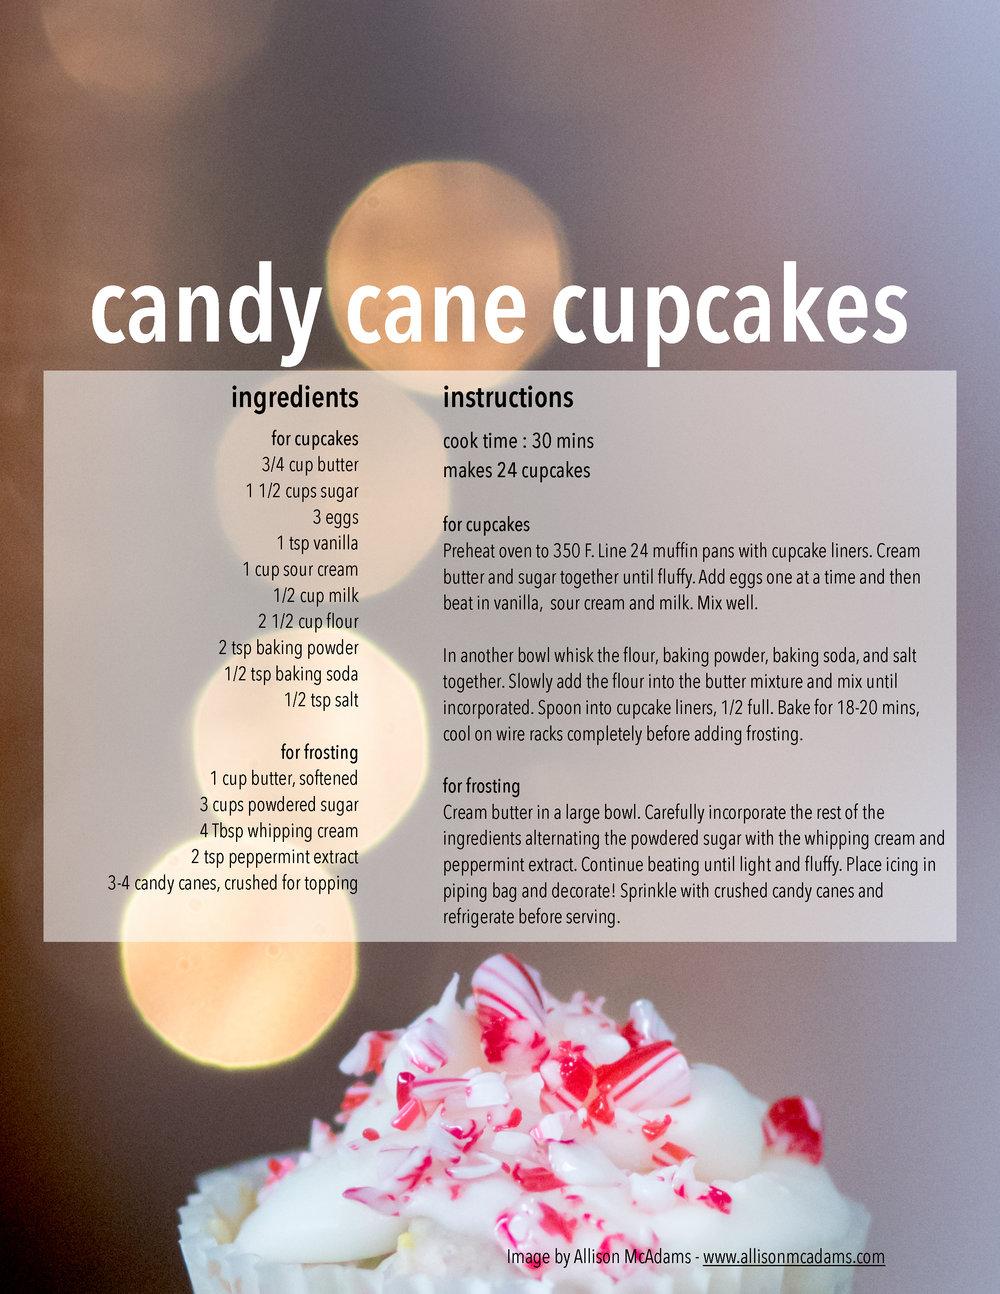 CandyCaneCupcakes